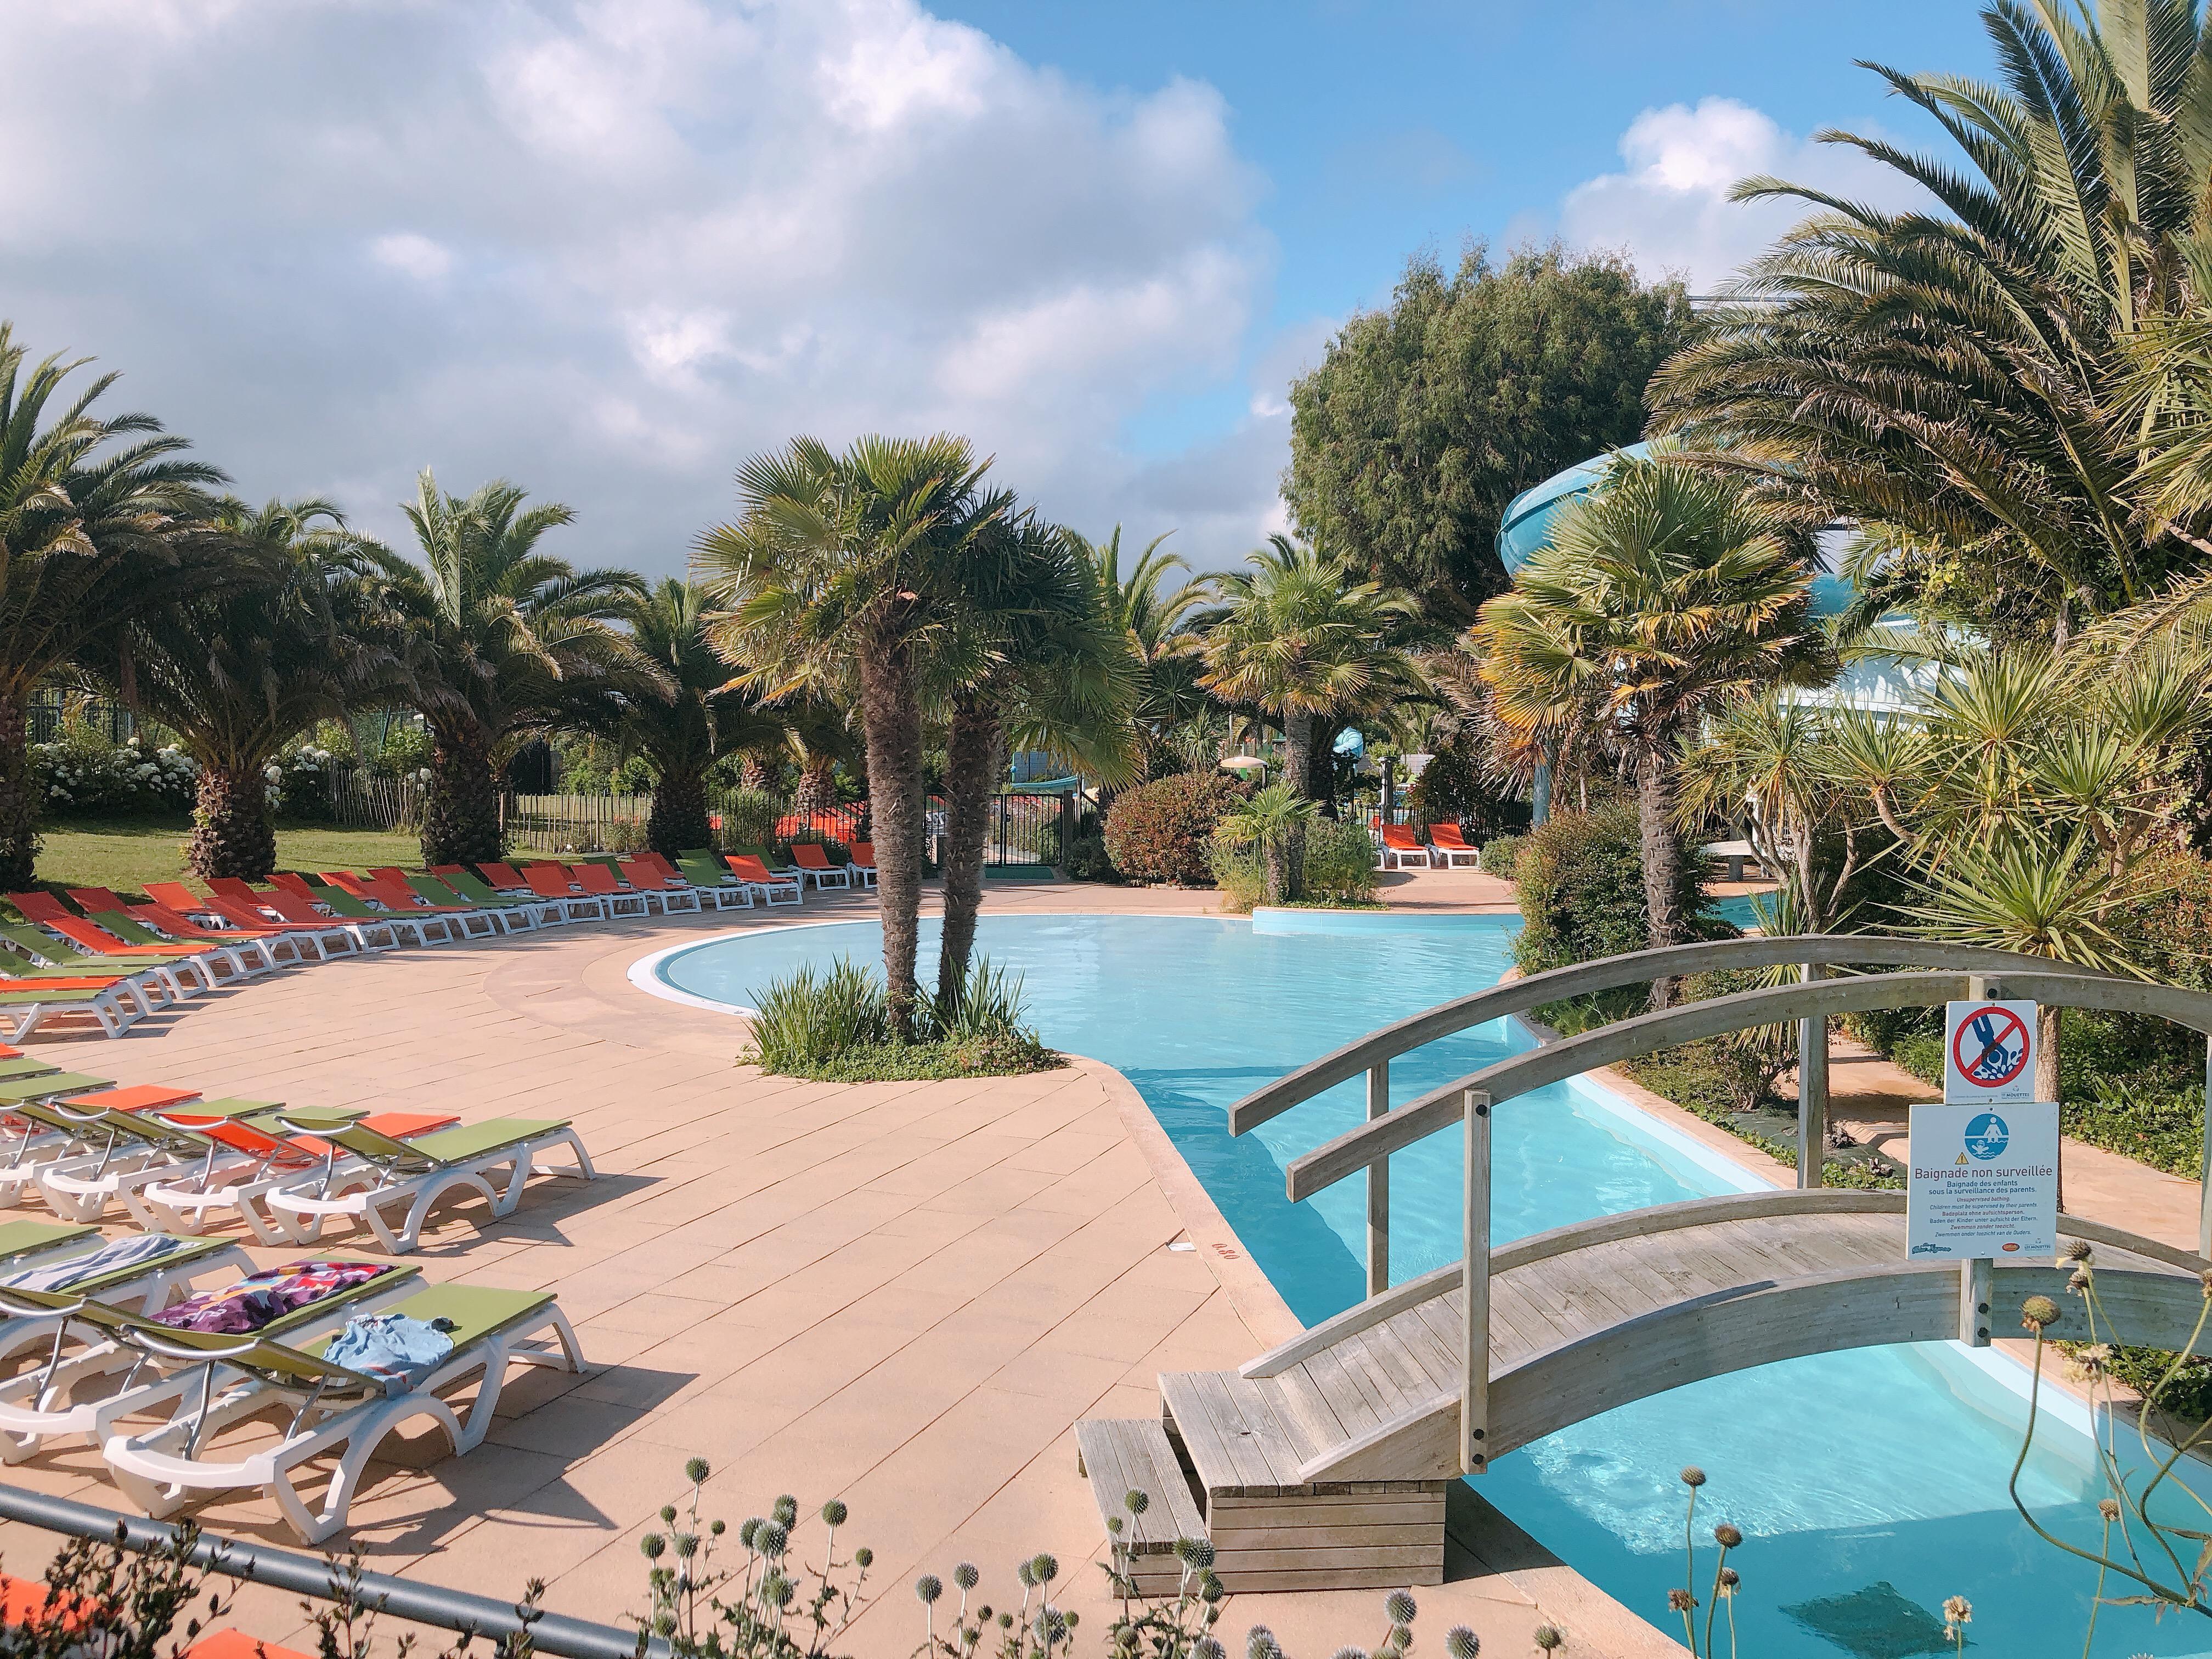 IMG 9381 4032x3024 - Fotodagboek Vakantie: Camping Les Mouettes, Bretagne!